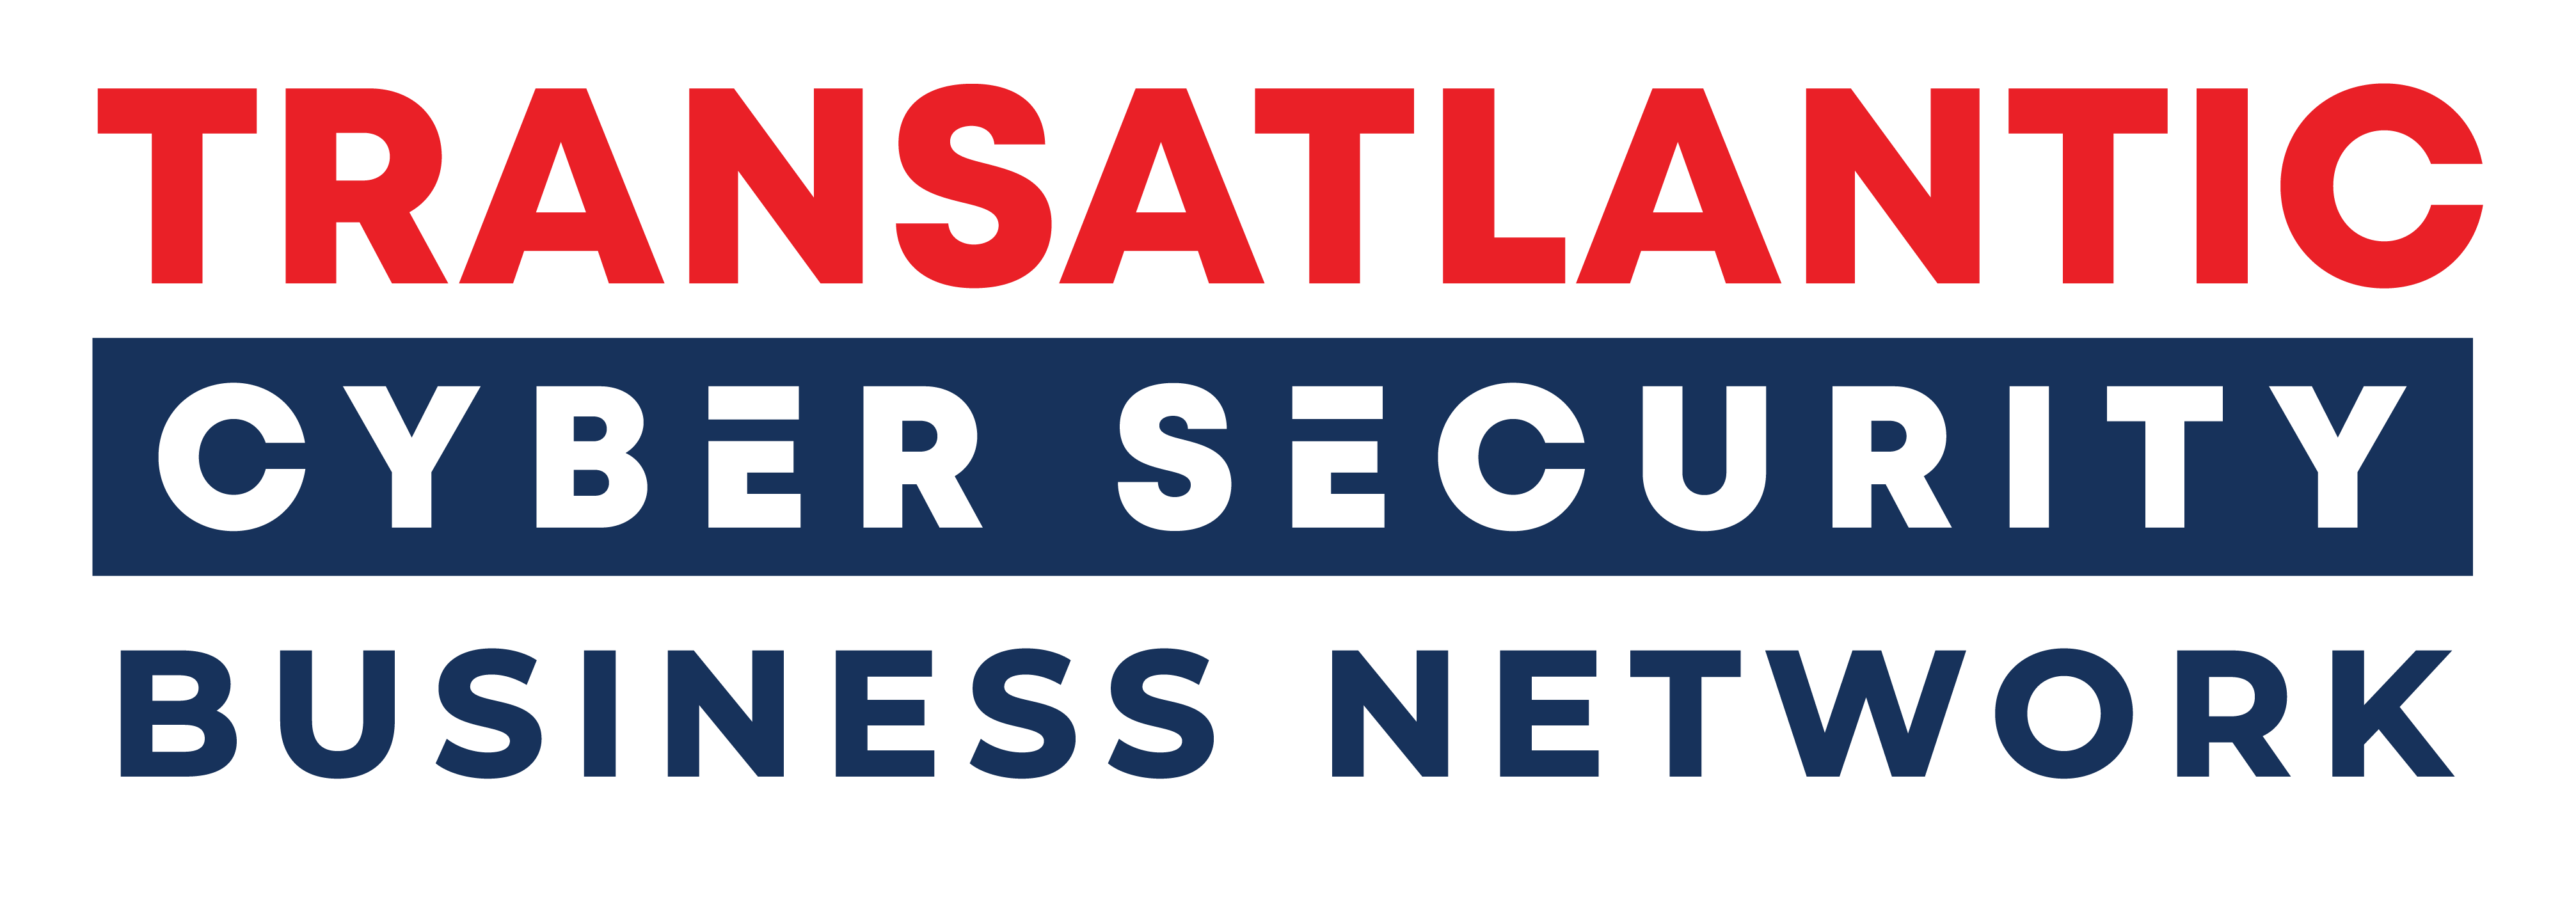 transatlantic cyber security network